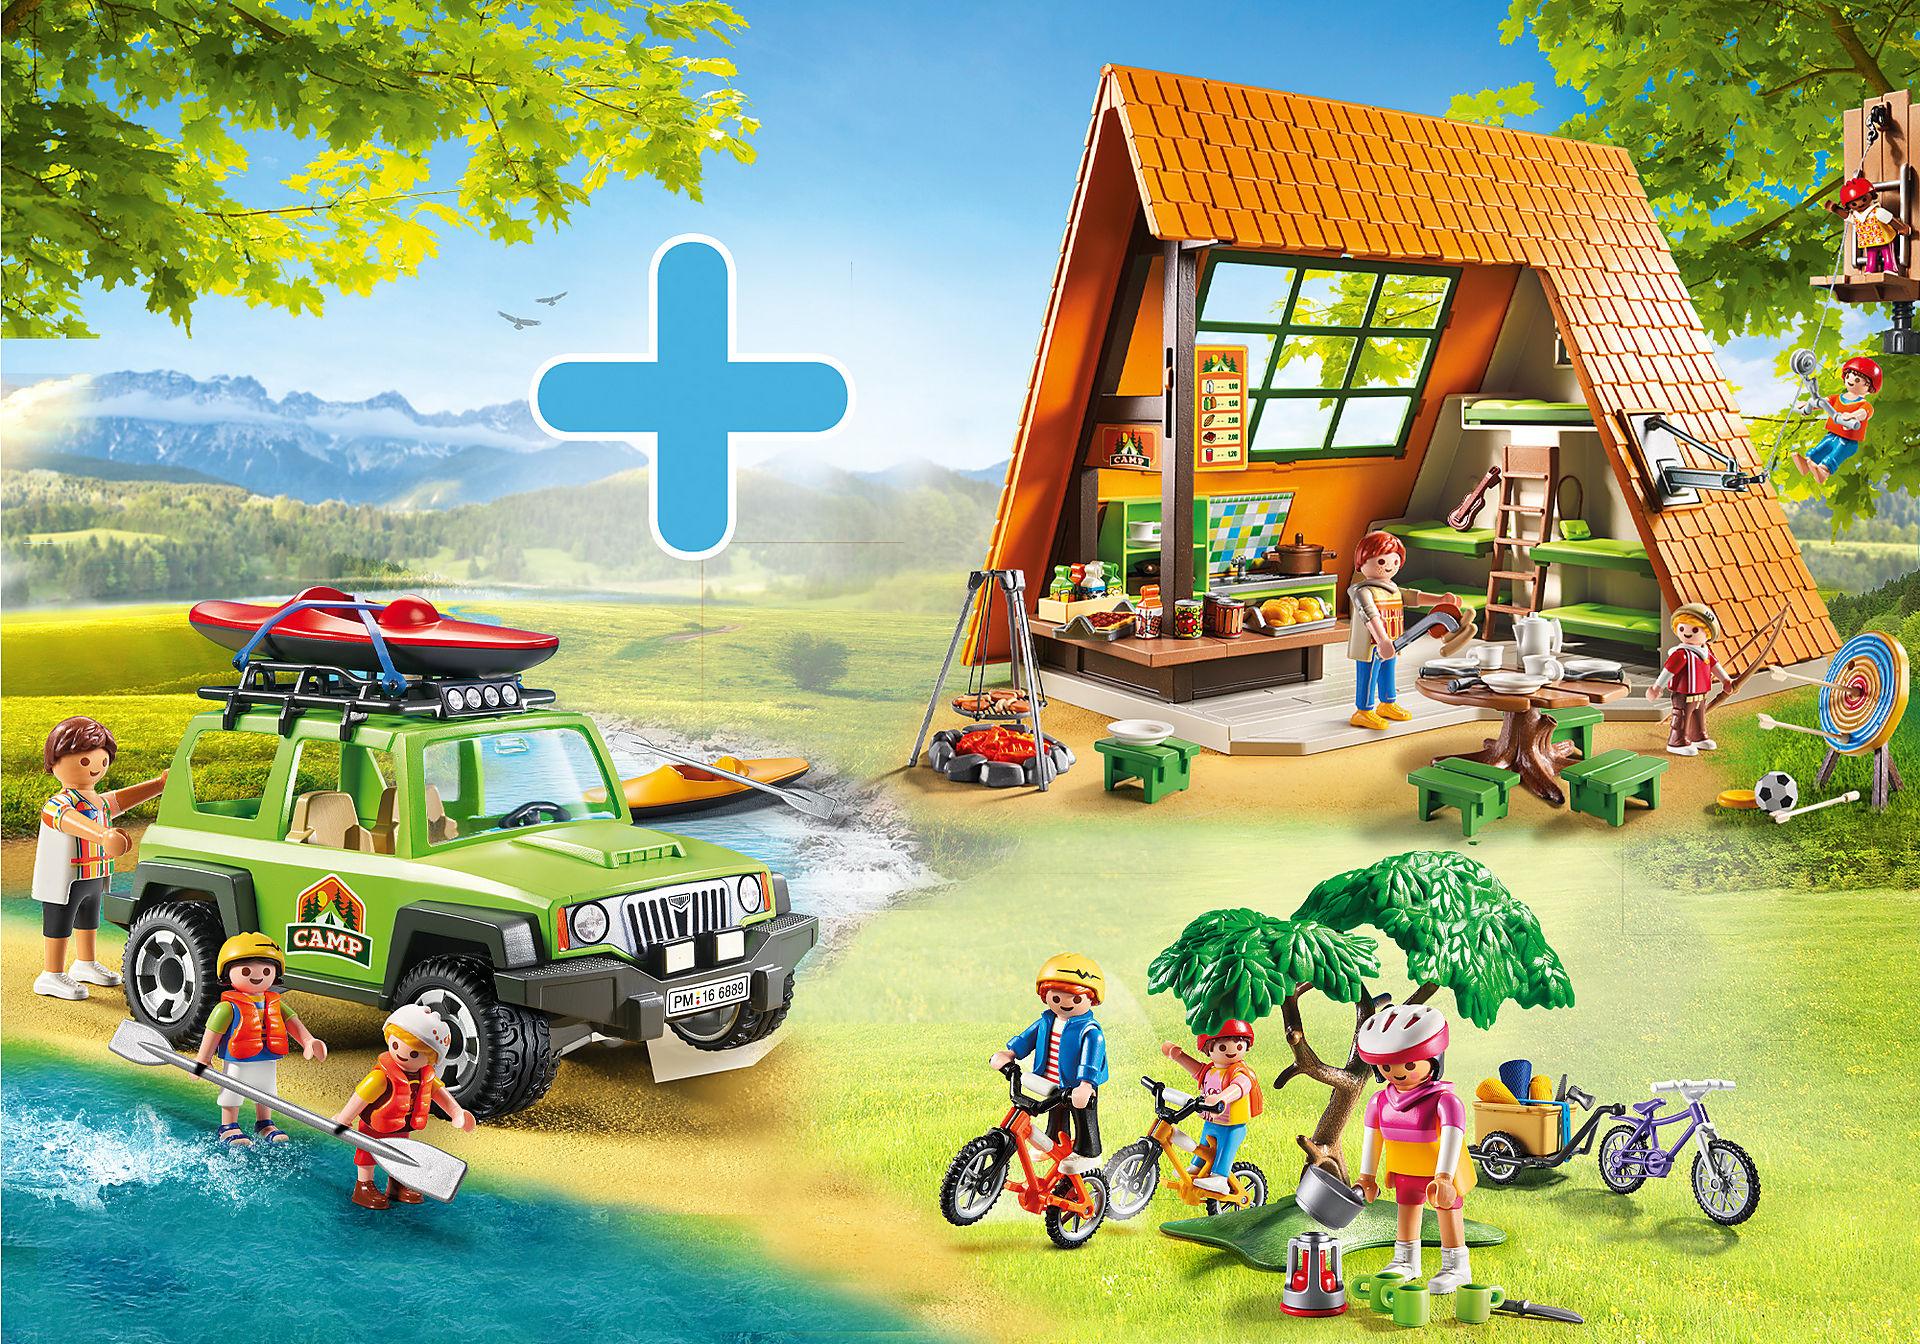 PM2014W Pack Promocional Cabana de Acampamento zoom image1